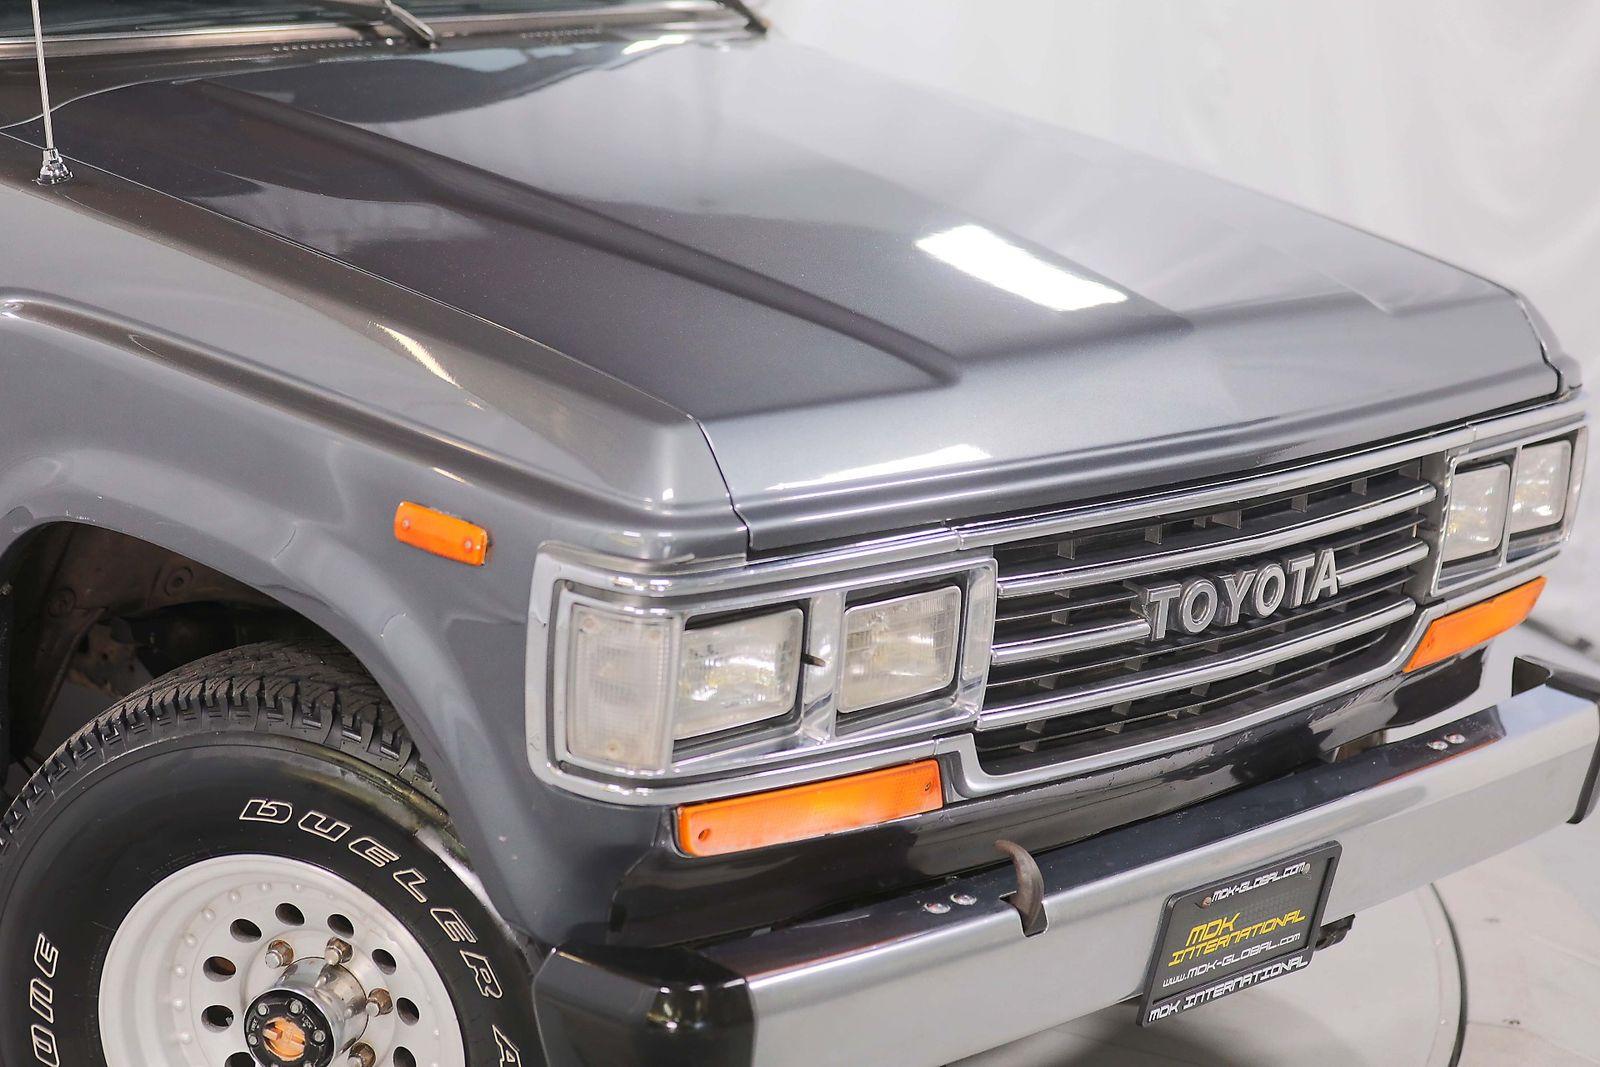 1988 Toyota Land Cruiser Fj62 Ac 1 Owner Ca Car City California